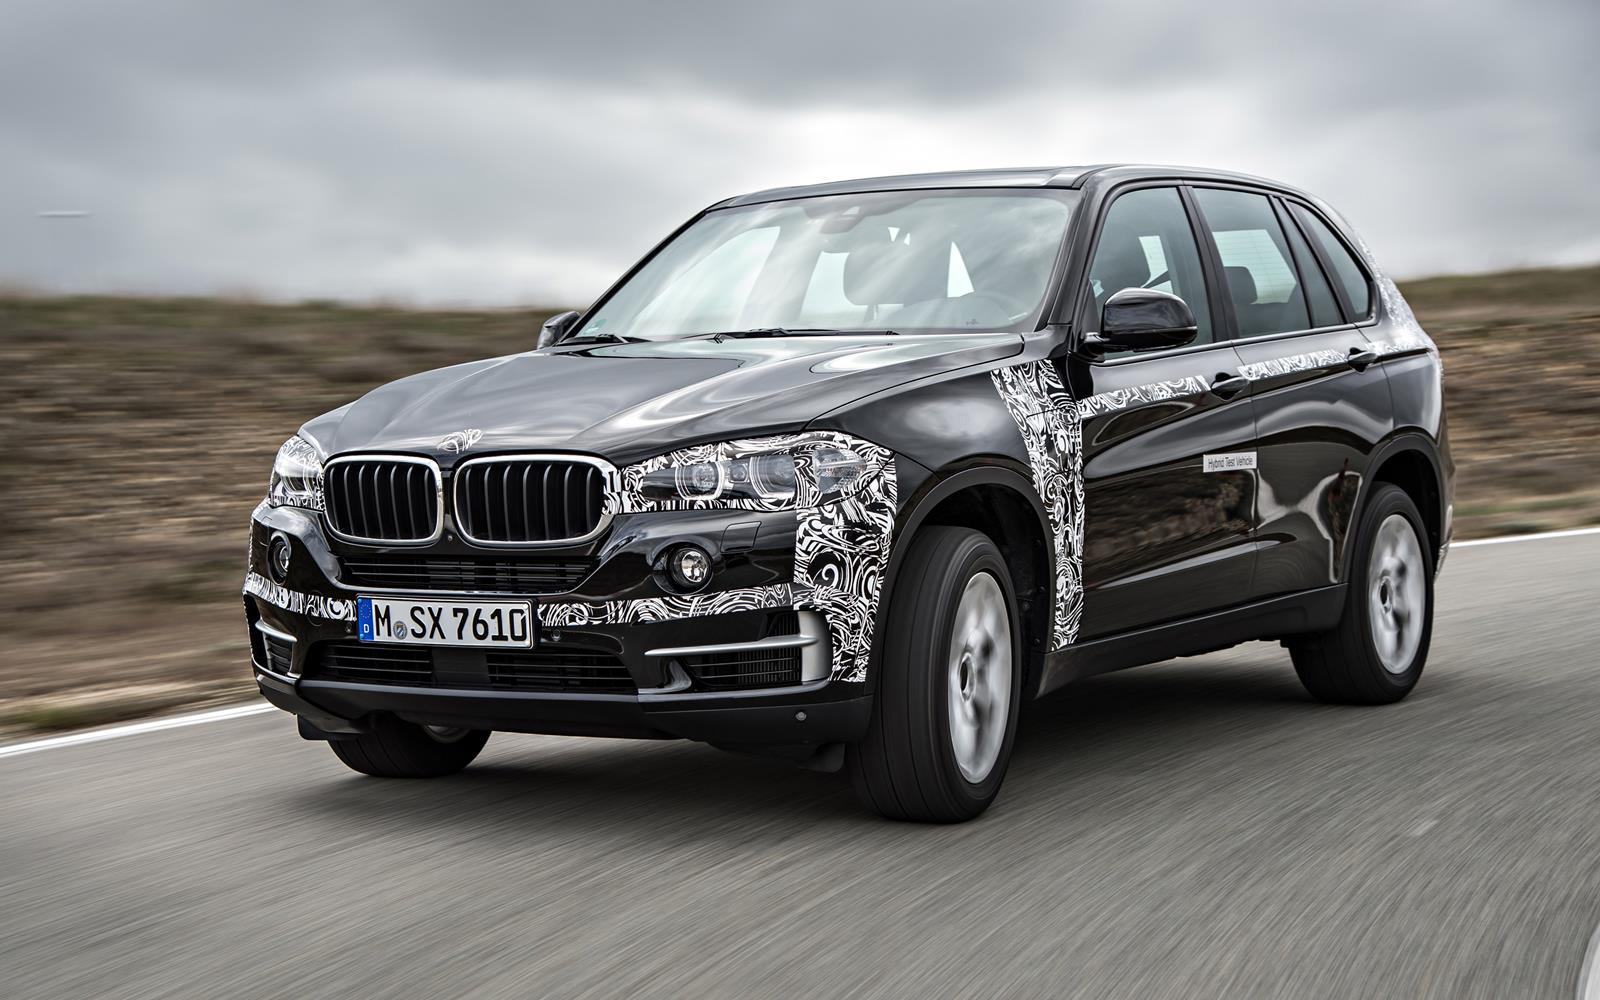 BMW X5 eDrive PHEV Prototype 2014 Front Left FrontSeatDriver.co.uk